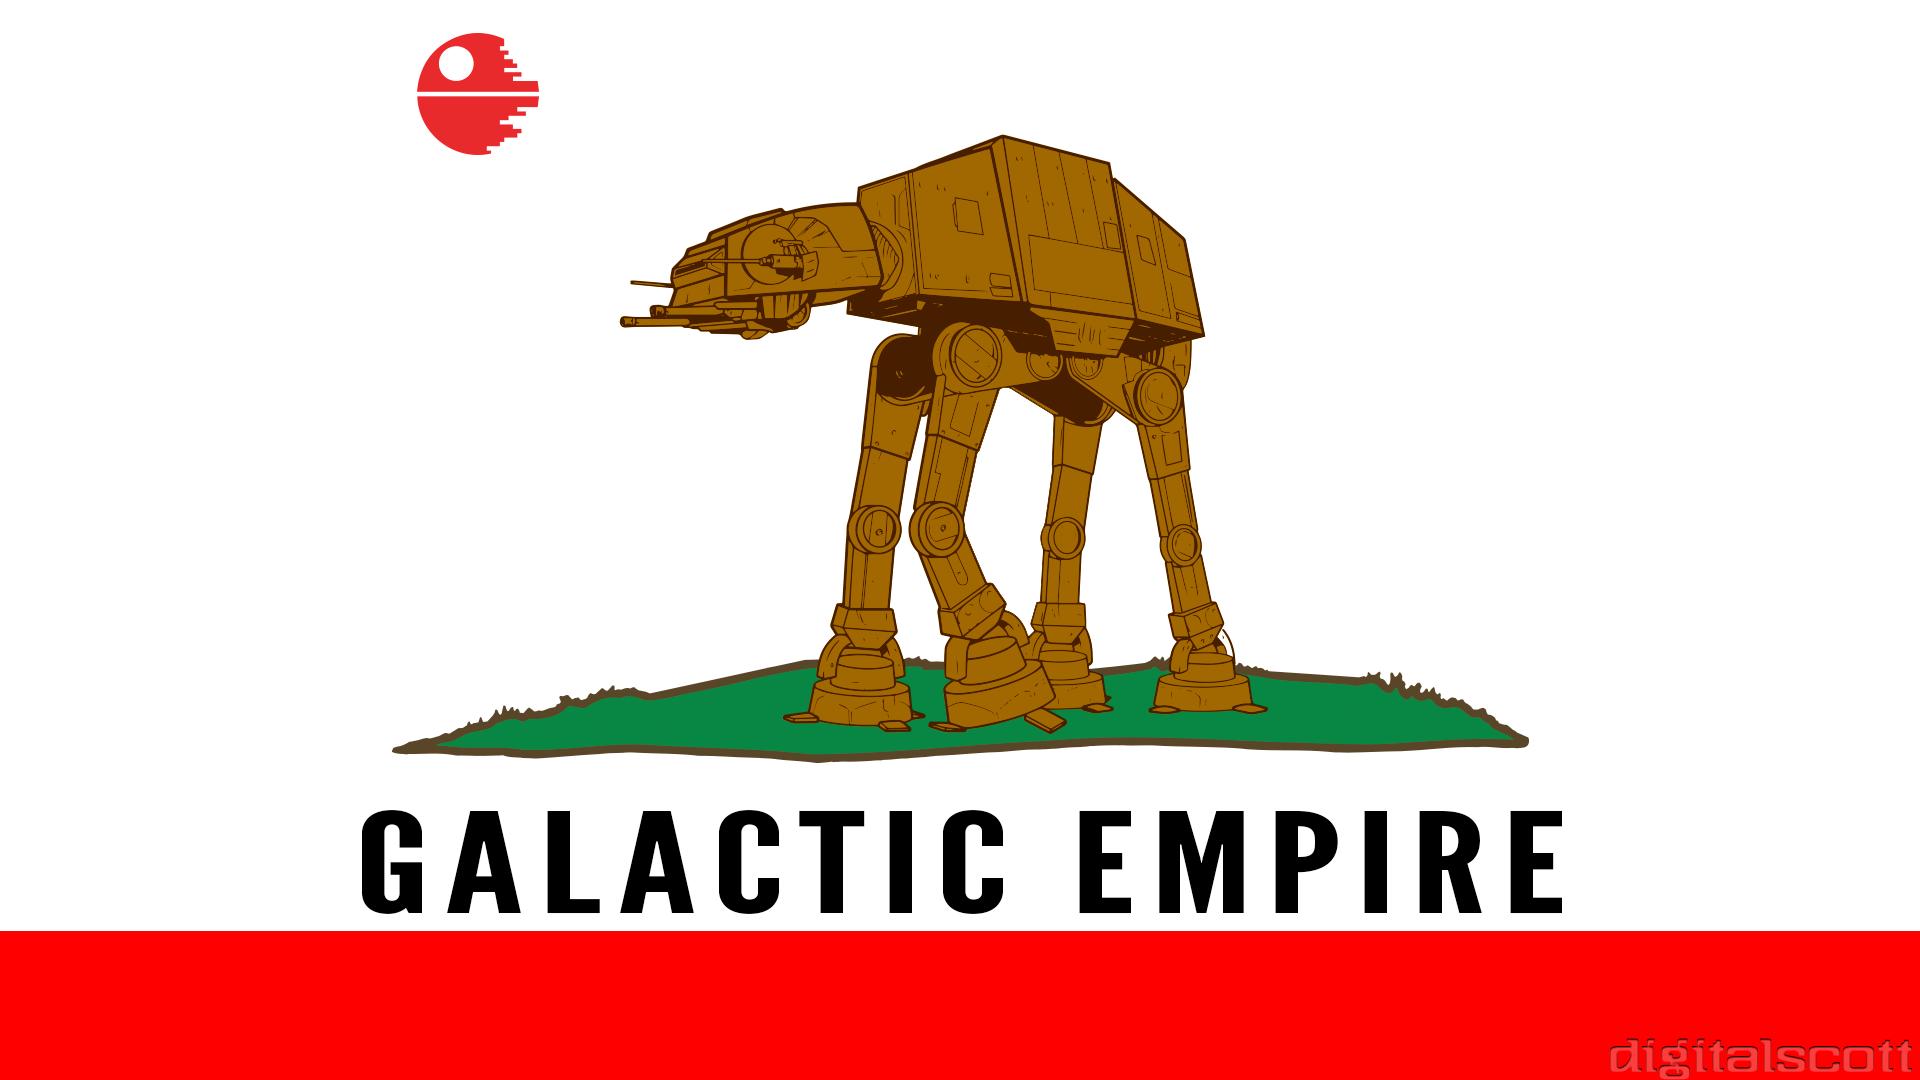 Galactic Empire Wallpaper Picture Star Wars Propaganda Hd 1194906 Hd Wallpaper Backgrounds Download